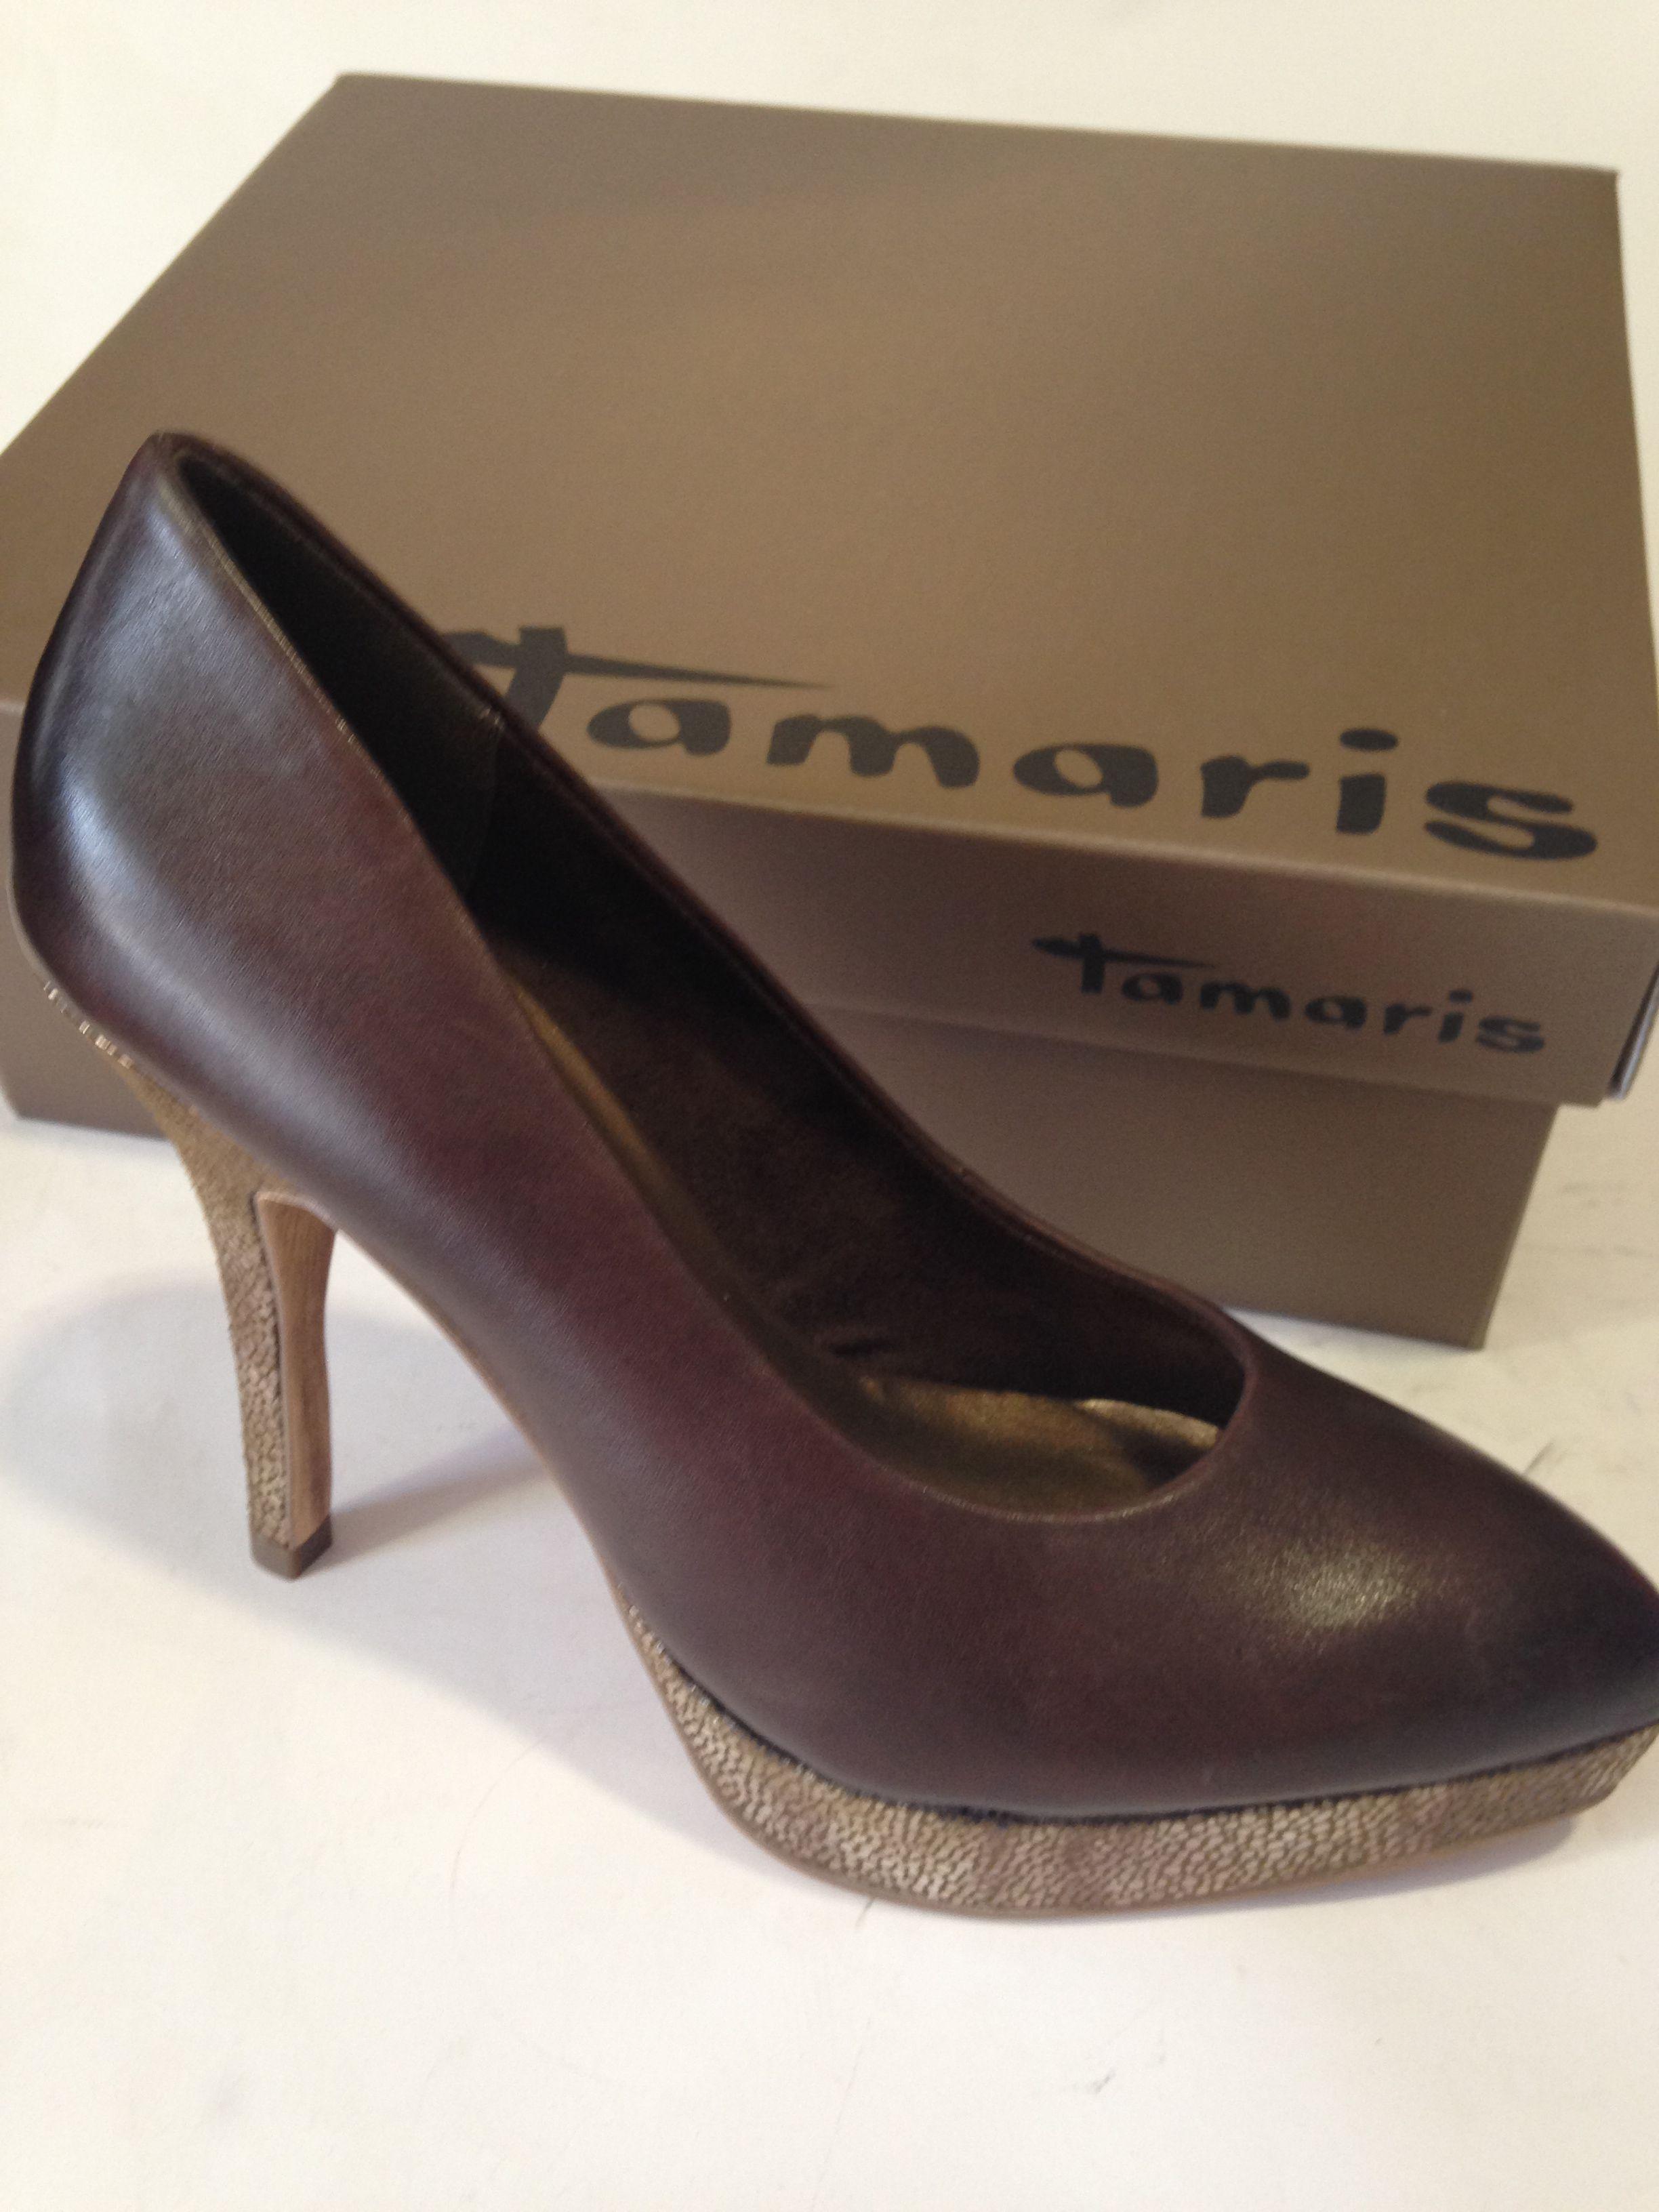 Tamaris shoe  ac3c69b9fa